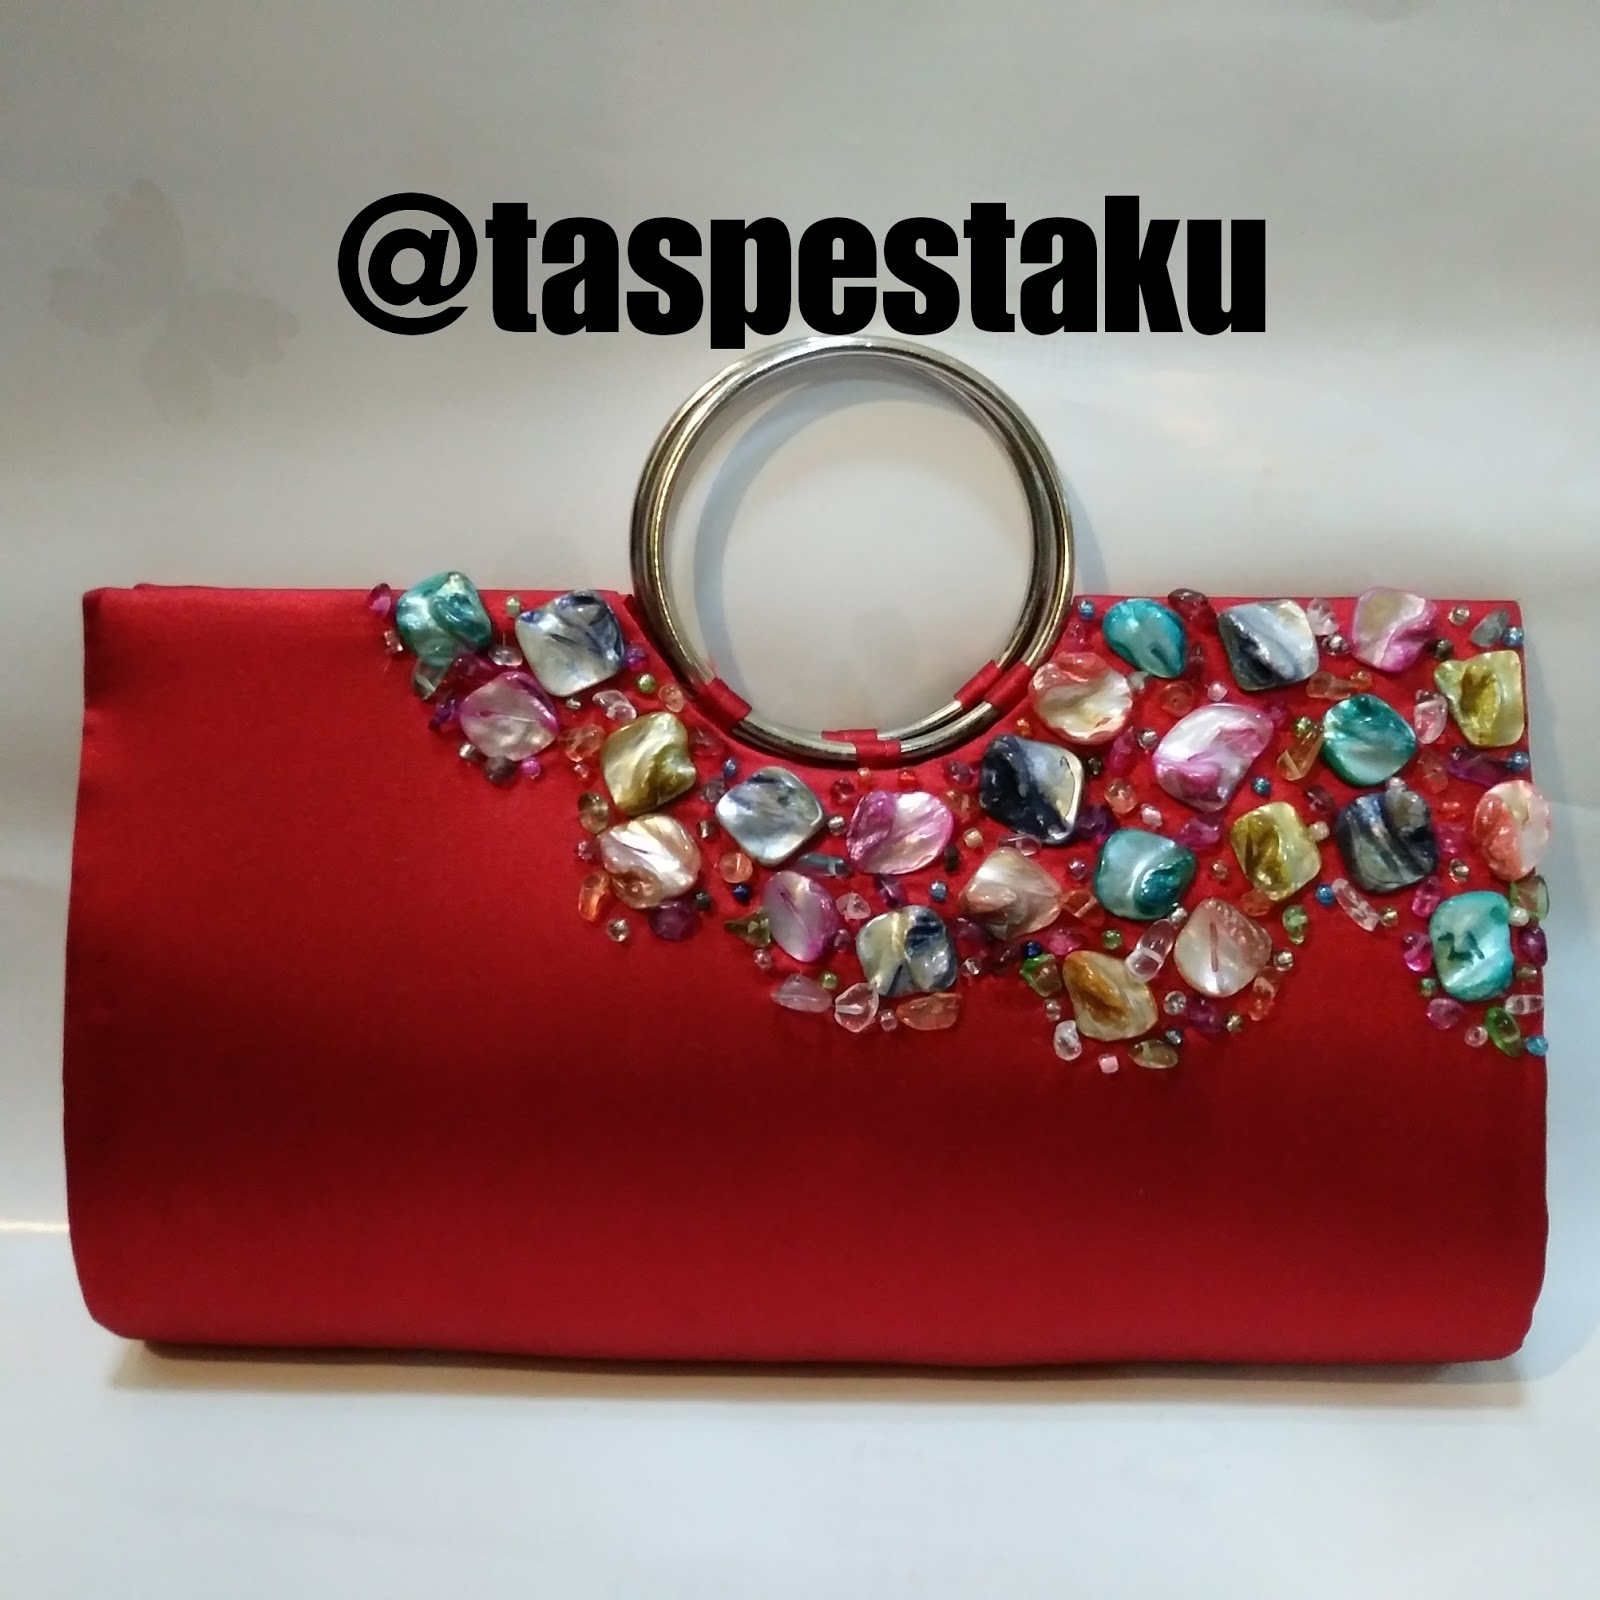 Handmade Tas Pesta Clutch Bag Merah Cabe Cantik Mewah Elegant (Ready Stock) 6b9bd6eb1f